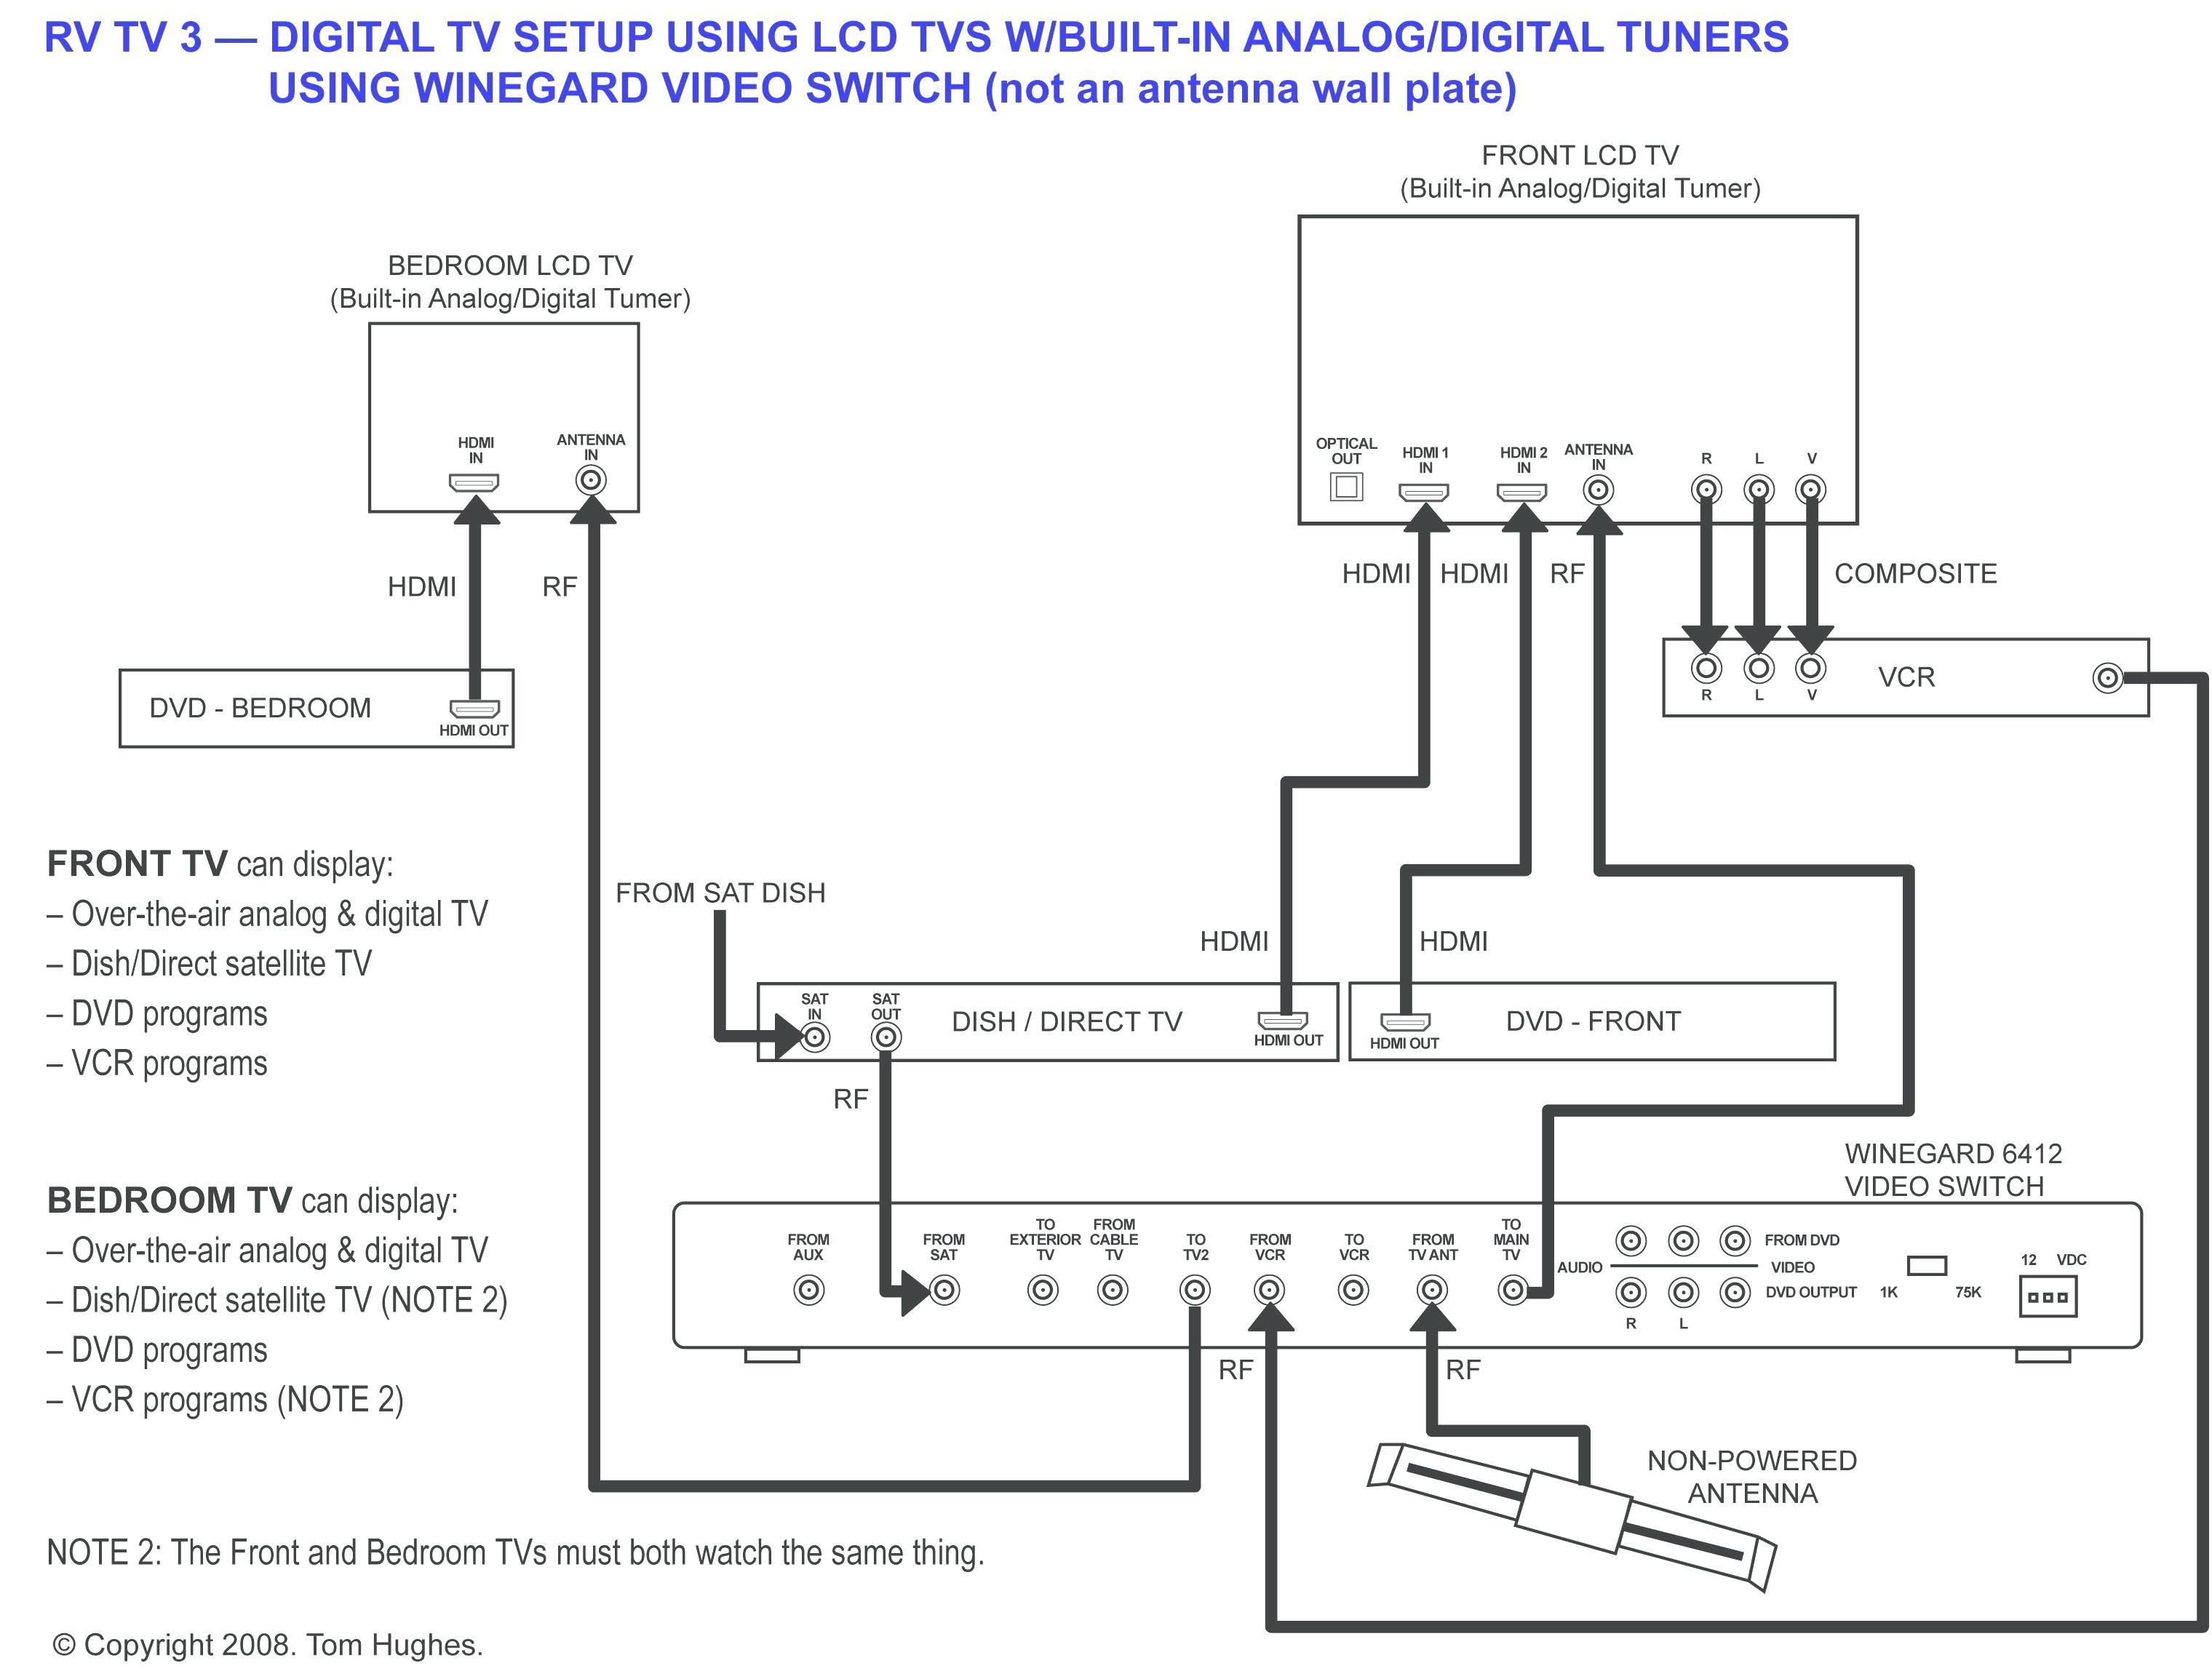 Commax Intercom Wiring Diagram Max 7 Hands Free Video Phone White Direct Tv Satellite Dish Of